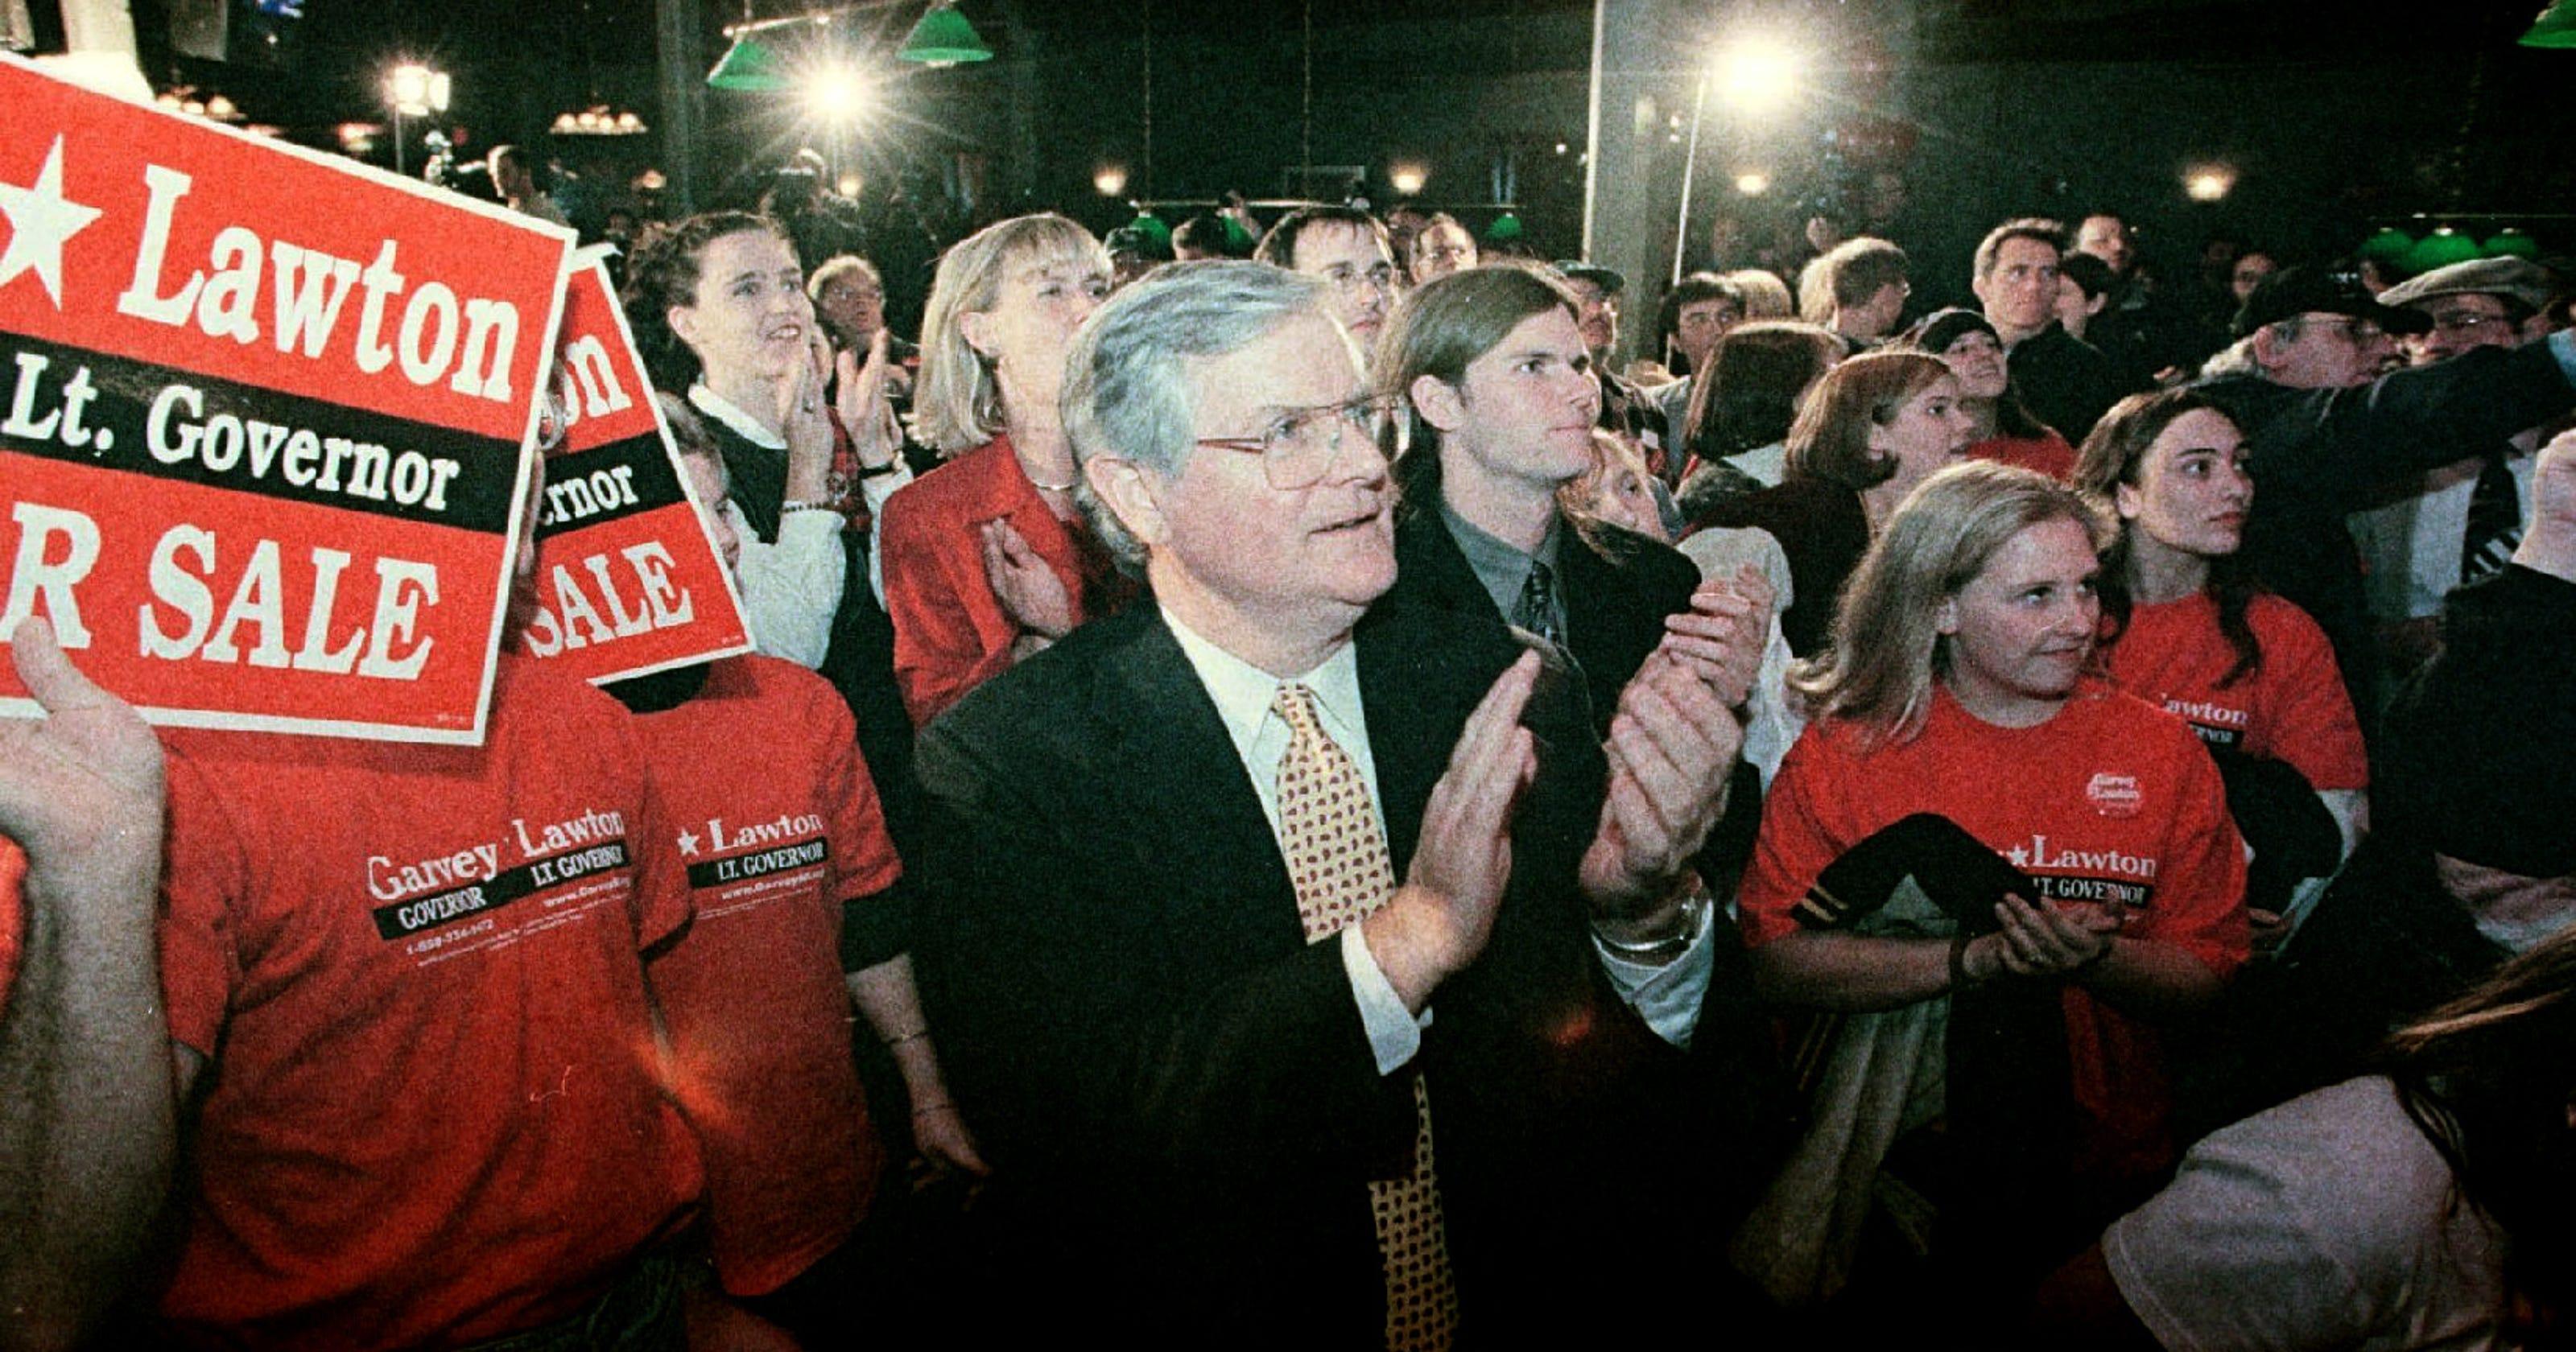 Ed Garvey, Wisconsin progressive and labor attorney, has died